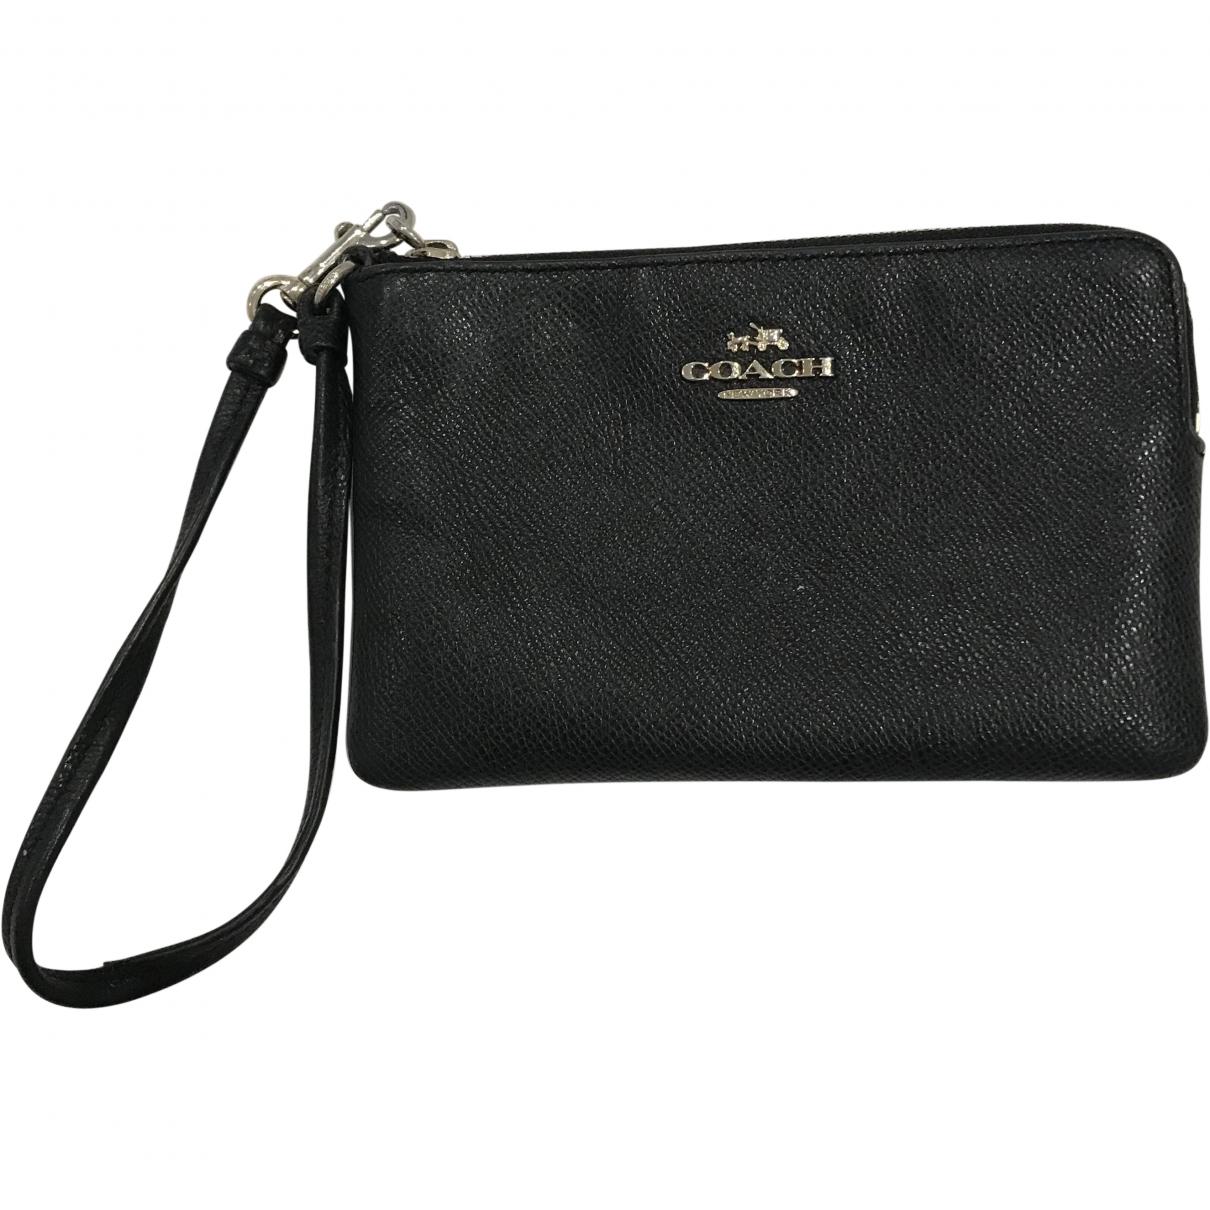 Coach \N Black Leather Clutch bag for Women \N